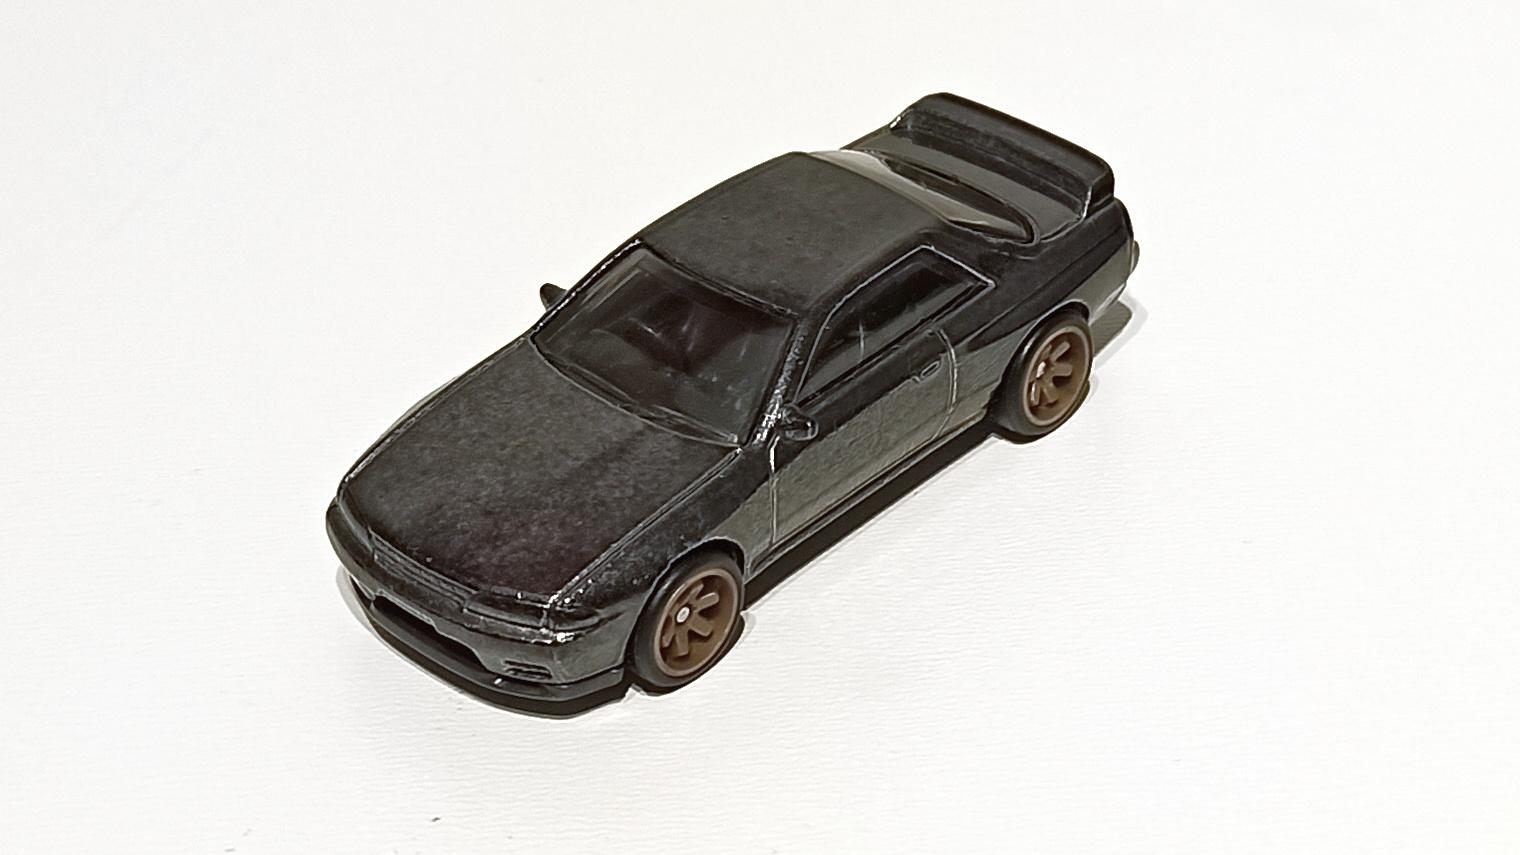 Hot Wheels Nissan Skyline GT-R (BNR32) (GHG23) 2020 (2/250) HW Turbo (5/5) spectraflame gunmetal grey Super Treasure Hunt (STH) top angle